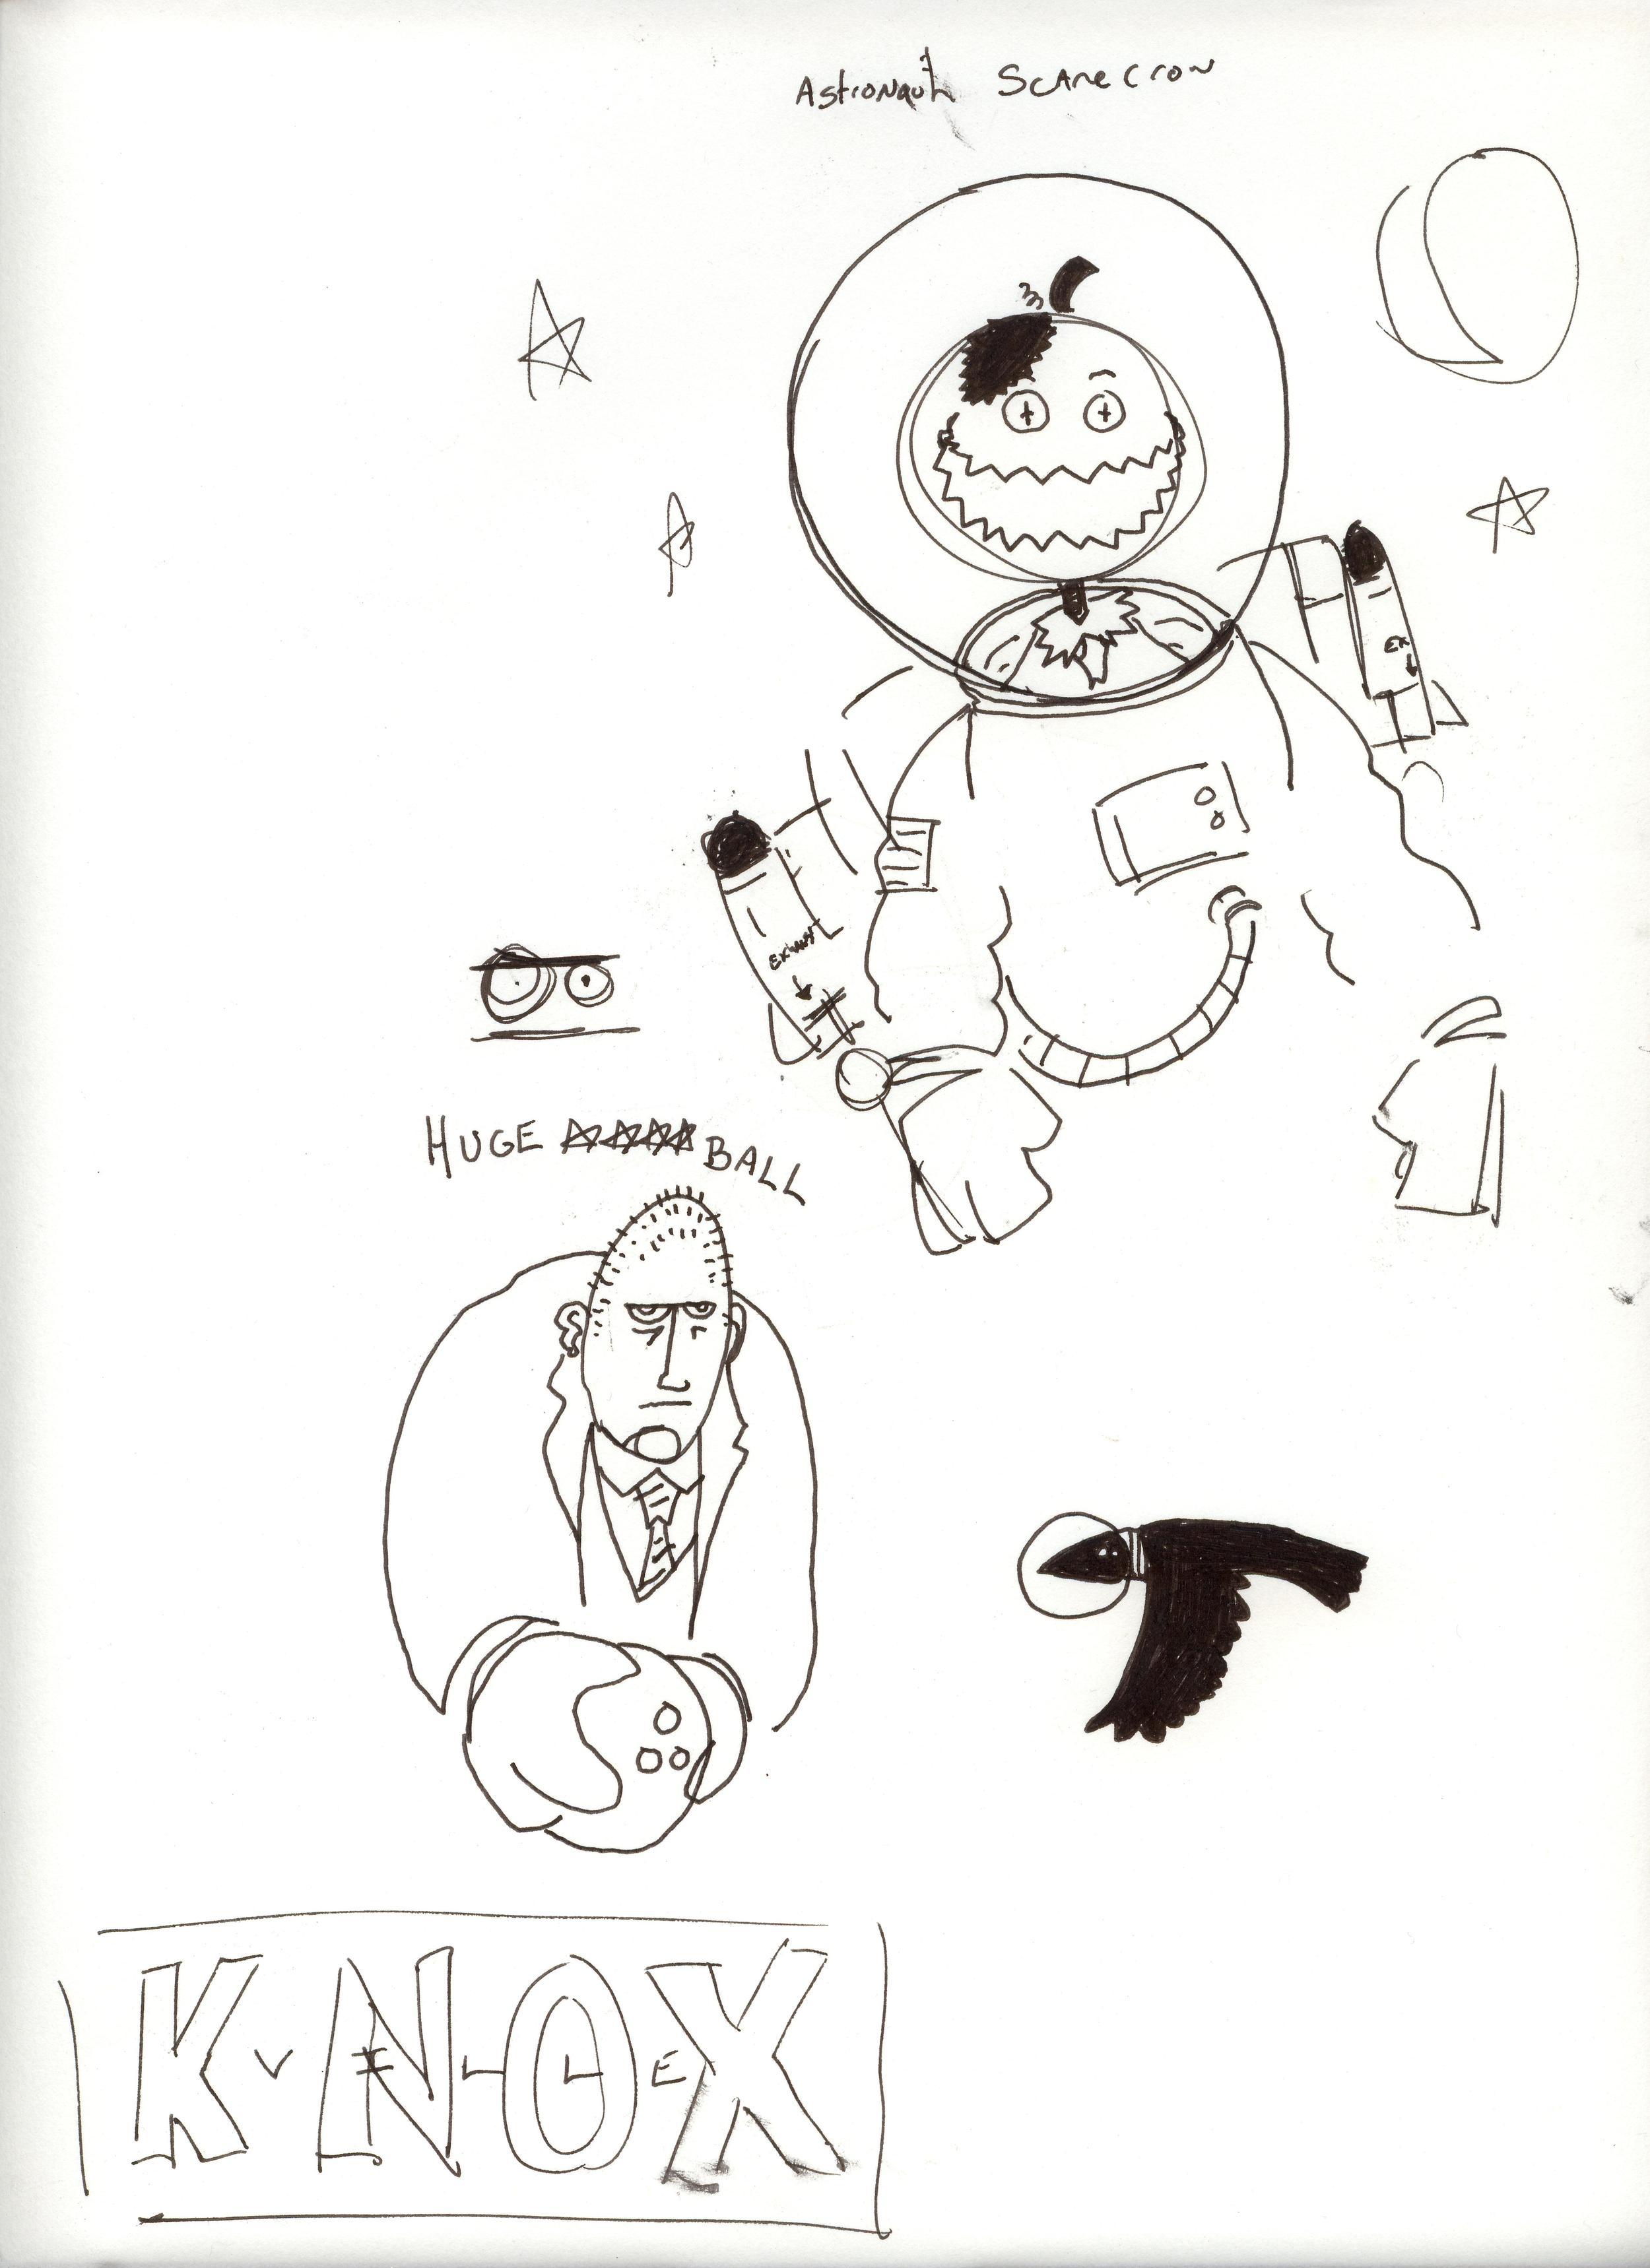 spacejackolantern.JPG